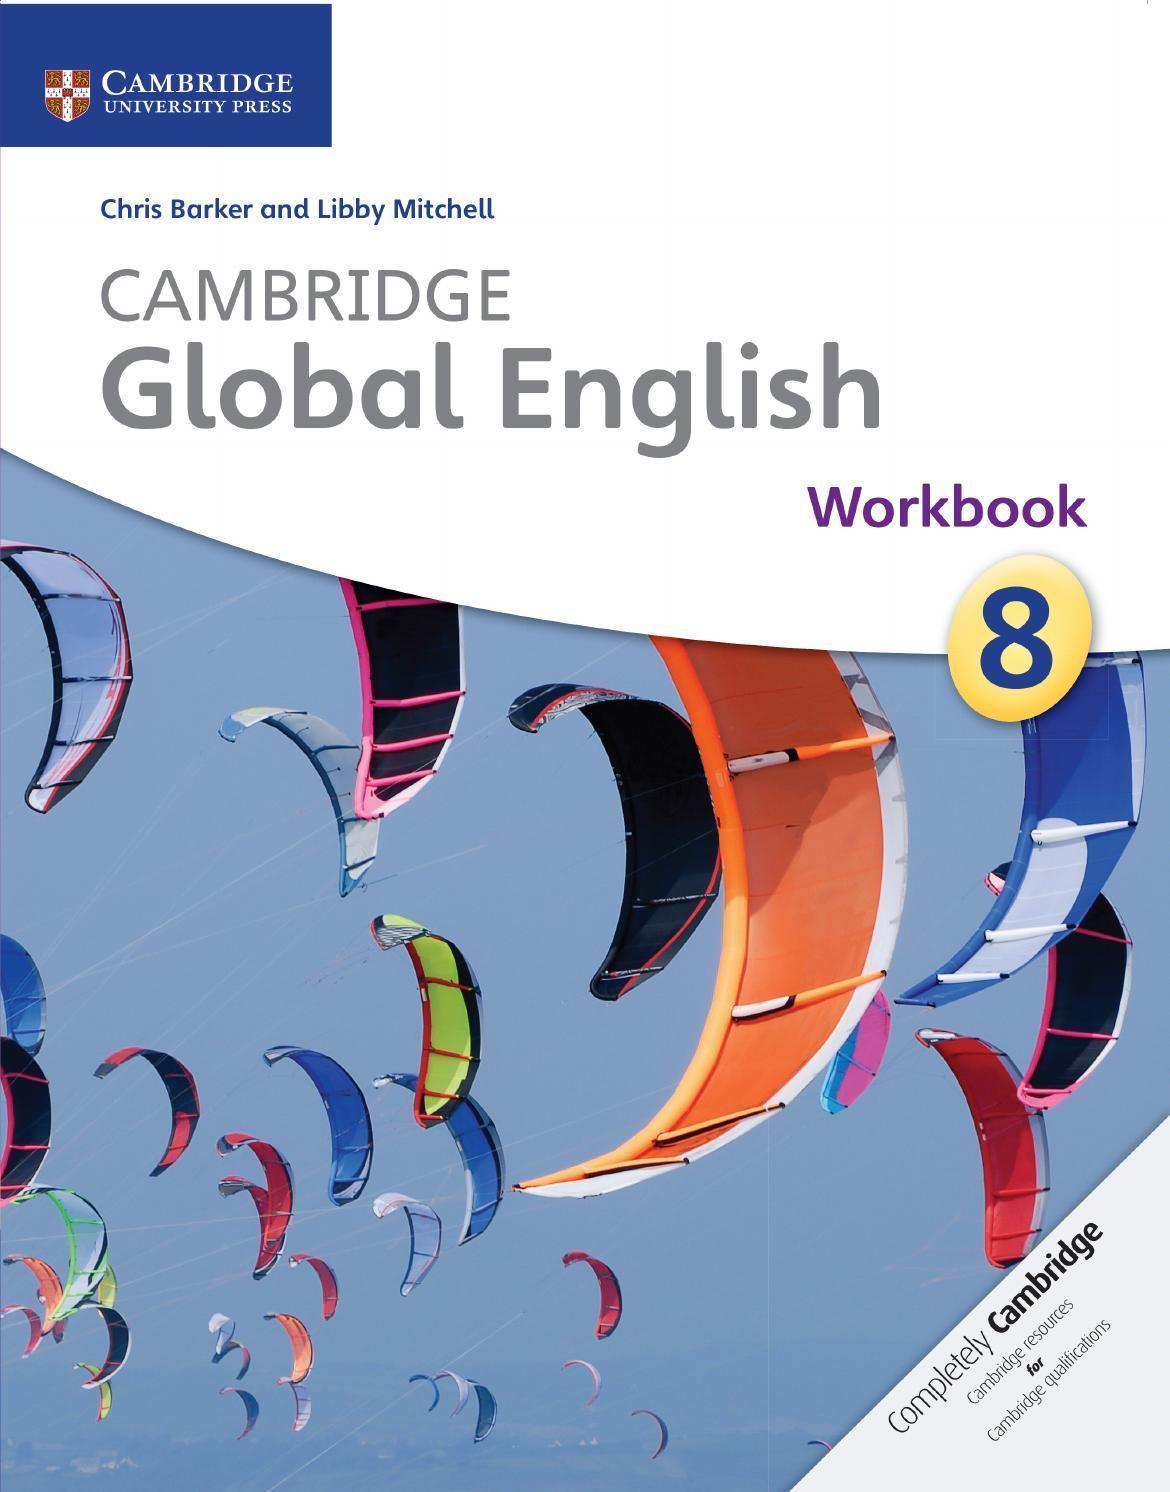 Preview Cambridge Global English Workbook 8 | Cambridge university ...